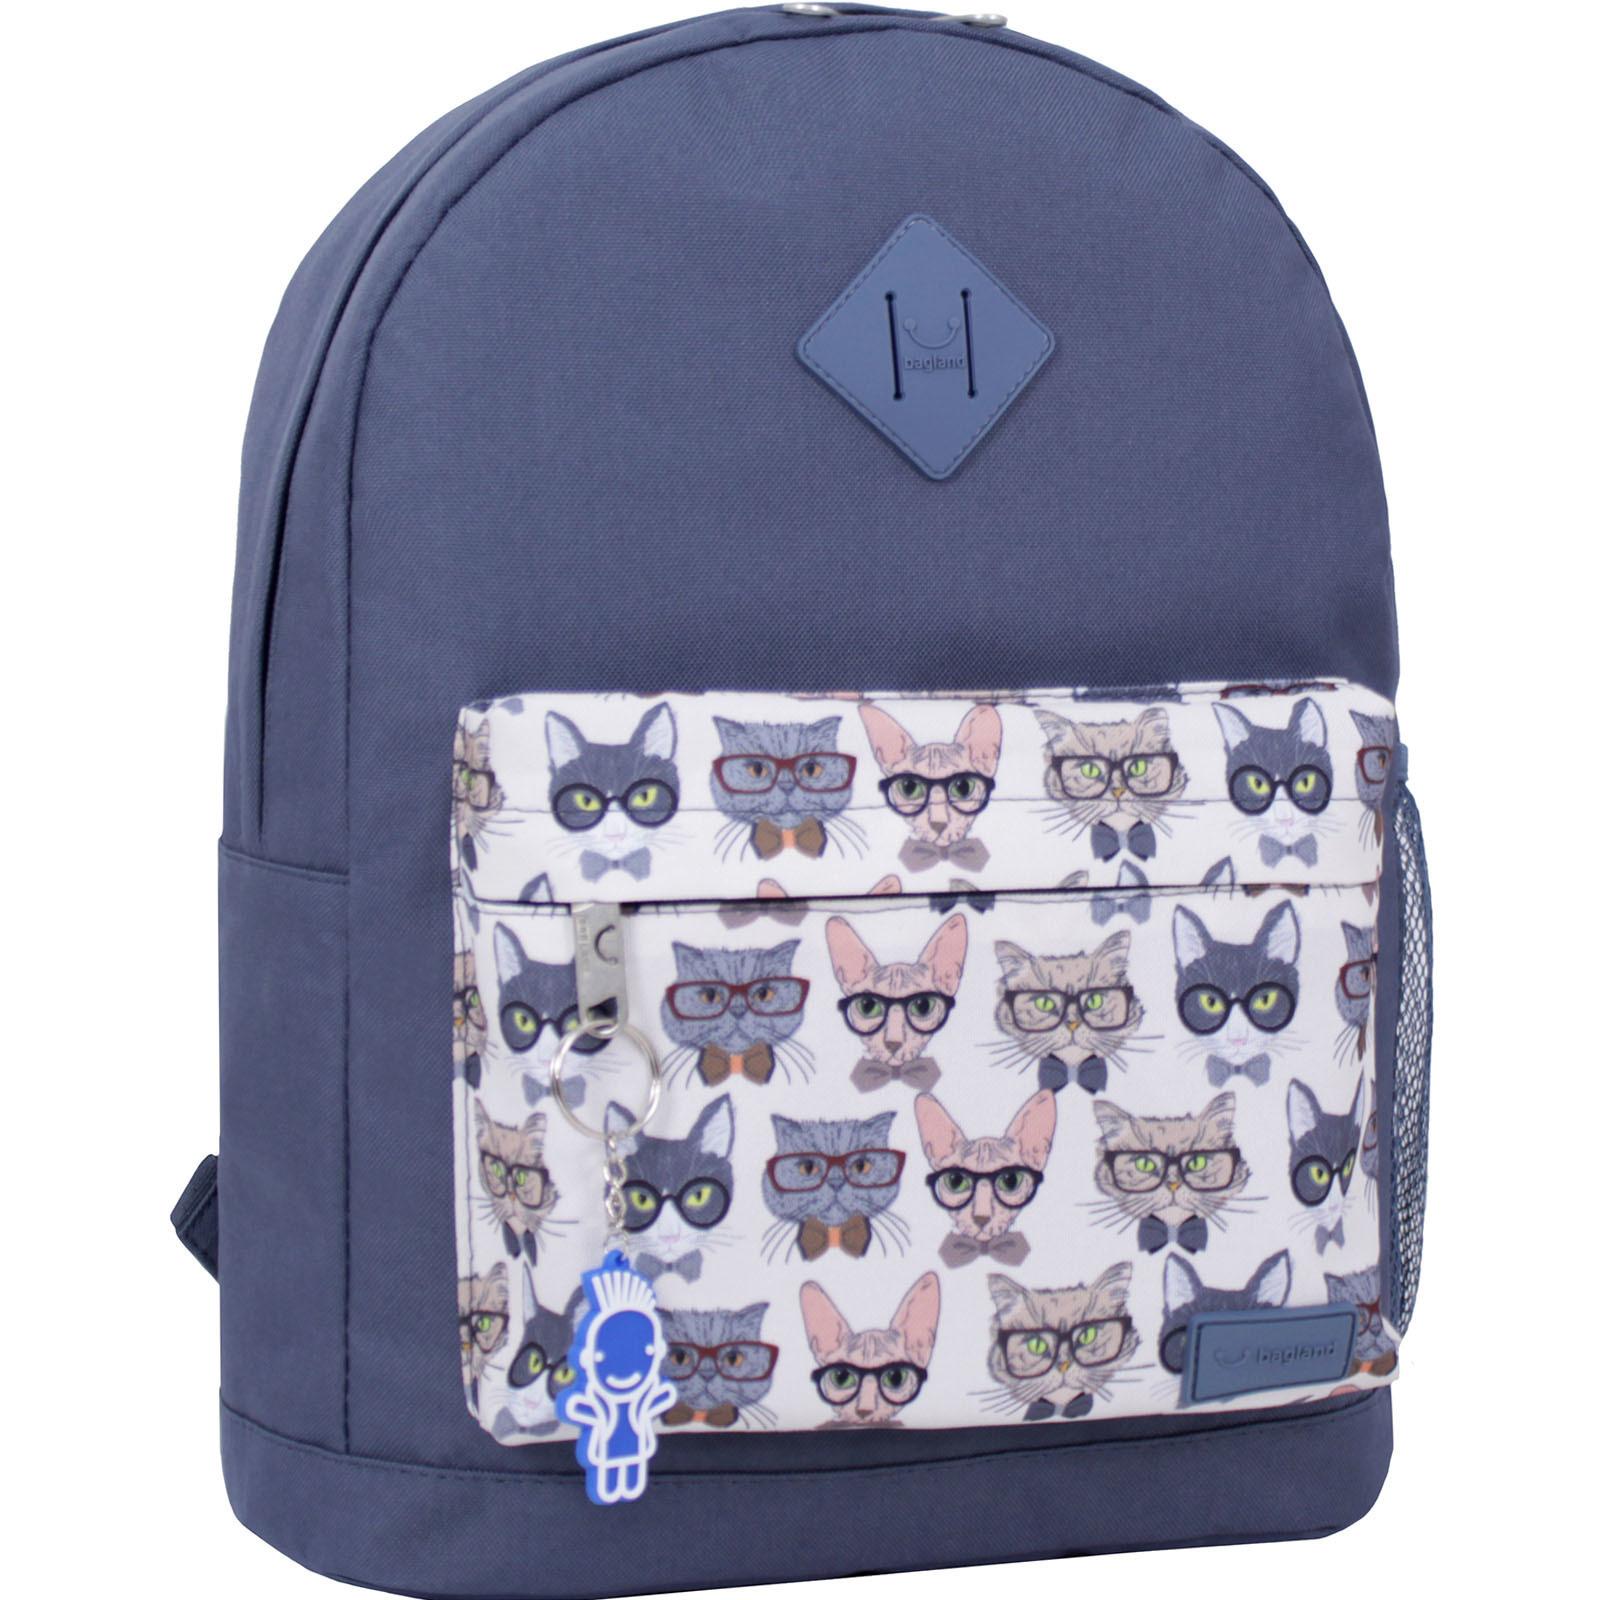 Городские рюкзаки Рюкзак Bagland Молодежный W/R 17 л. 321 сірий 28 (00533662) IMG_2133__суб.28_.JPG